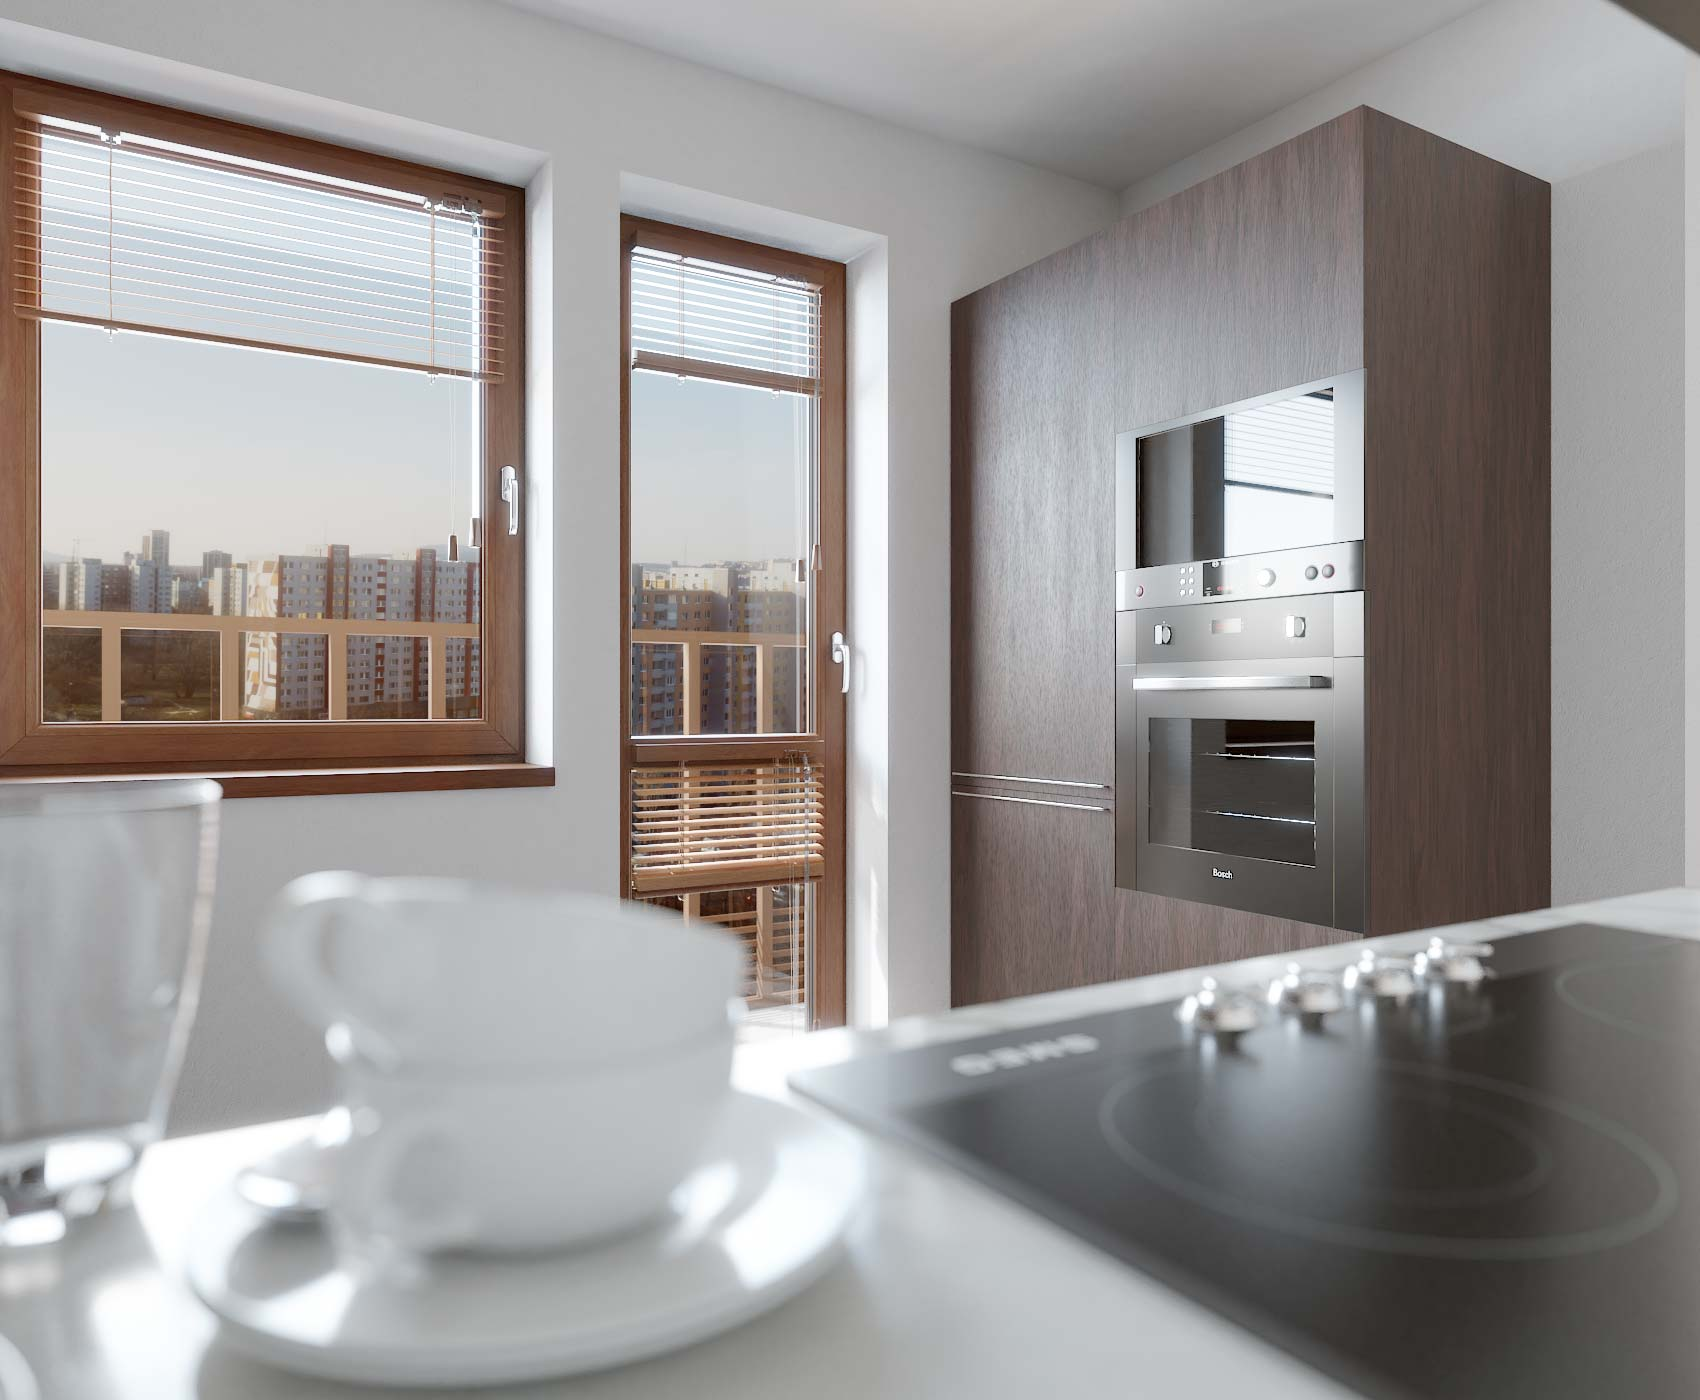 idea3d - vizualizácia kuchyňa 1